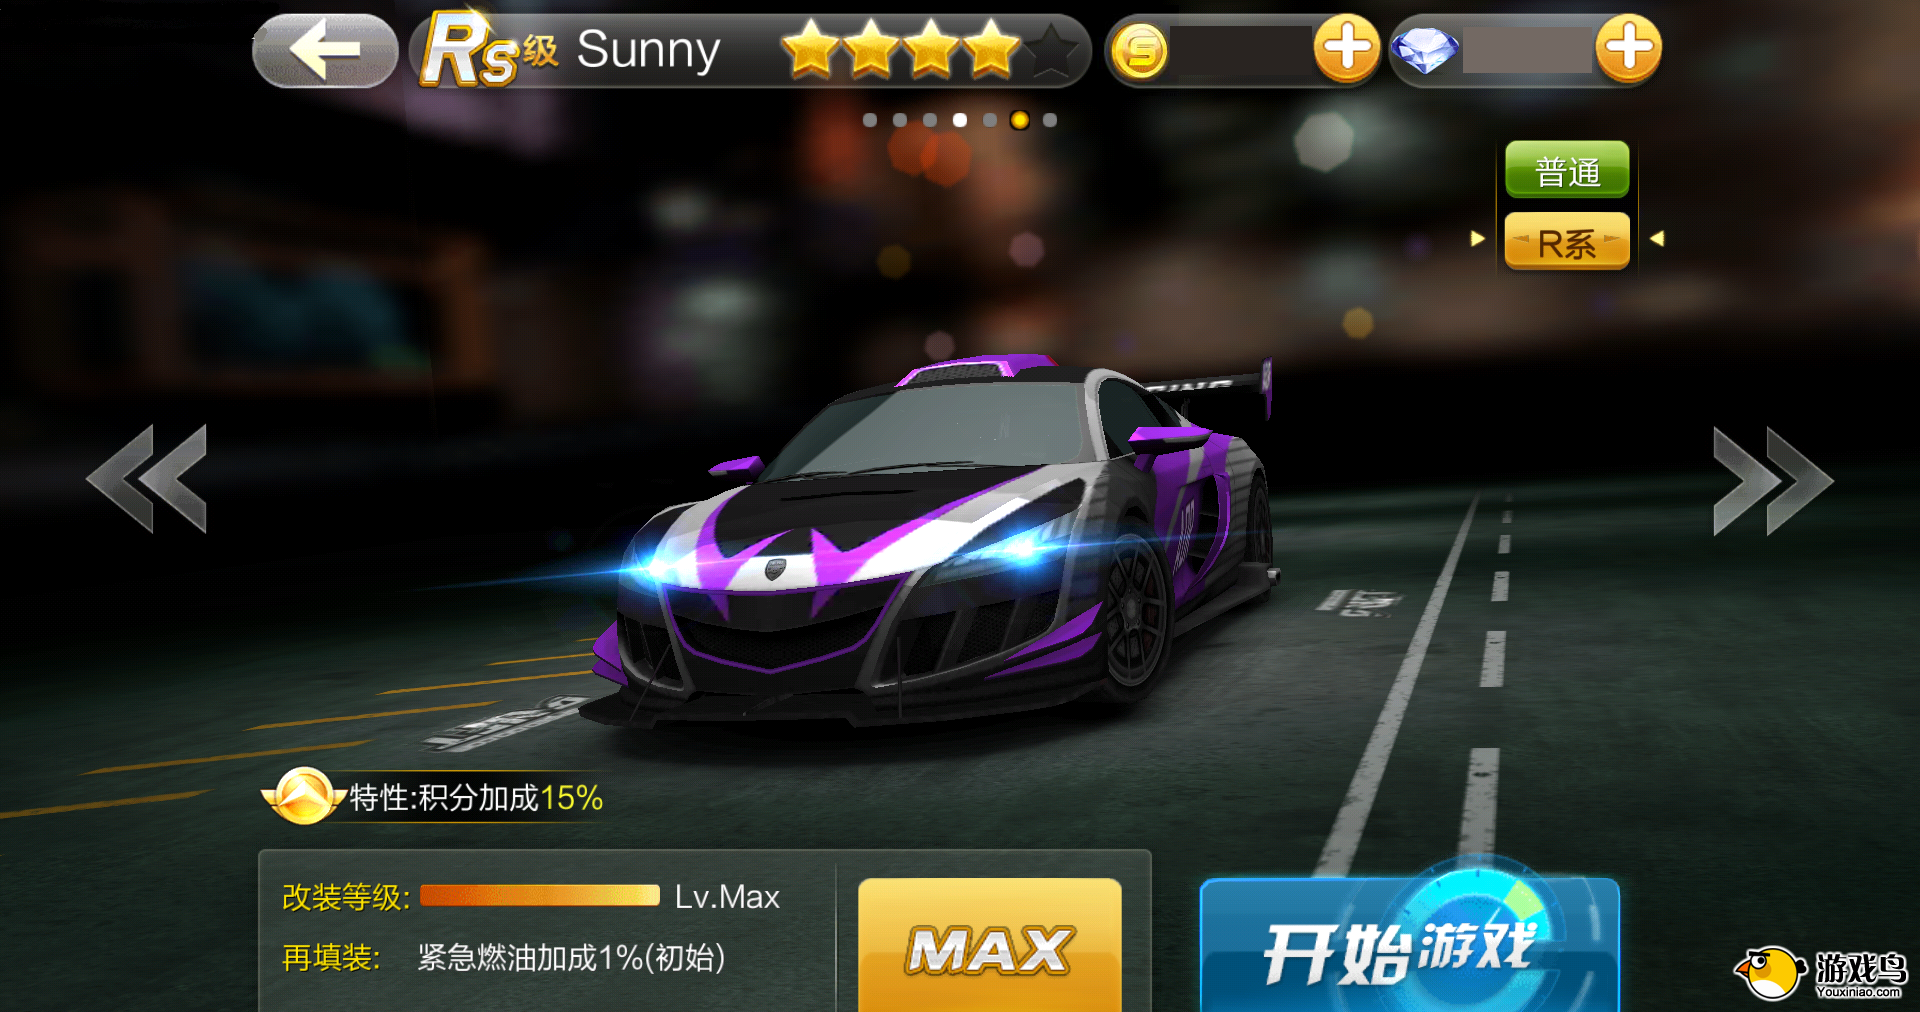 RS级Sunny 赛车性能介绍[图]图片1